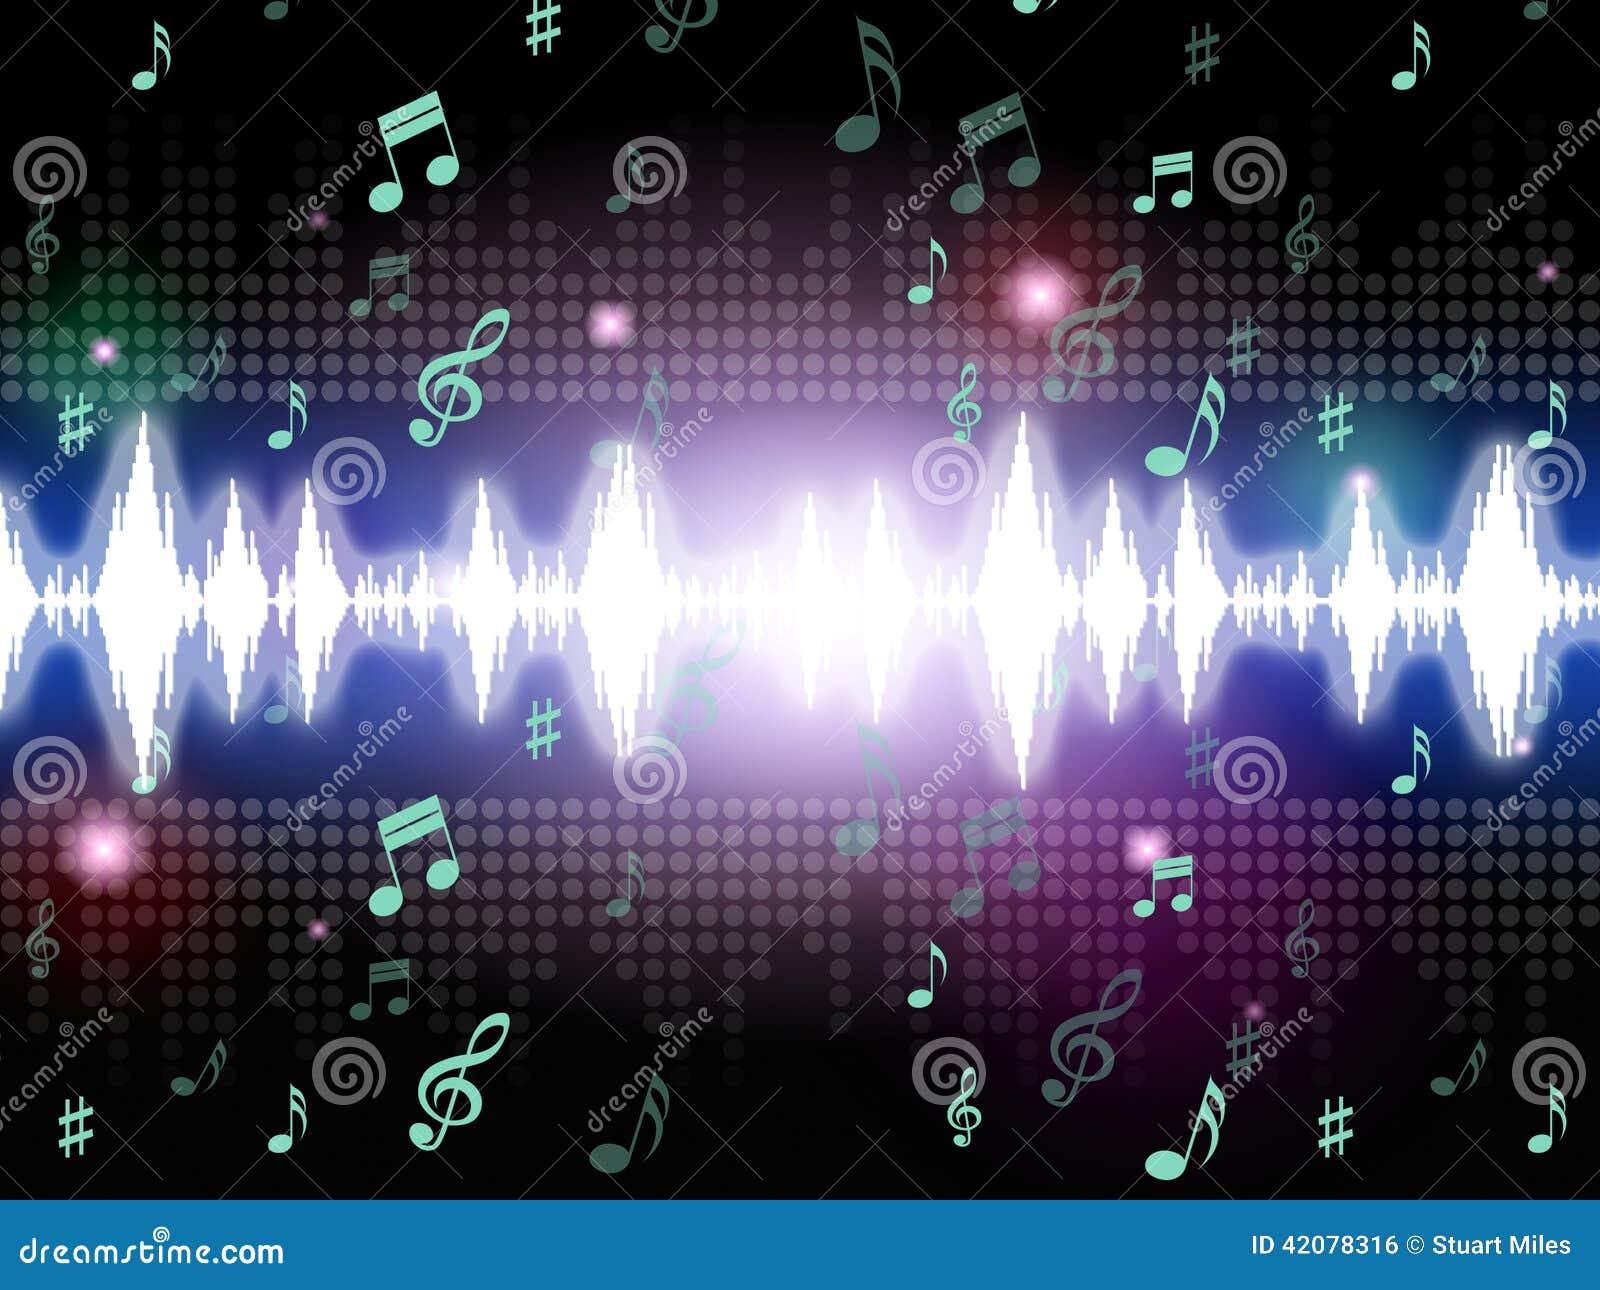 soundwaves背景意思音乐唱歌和曲调.图片